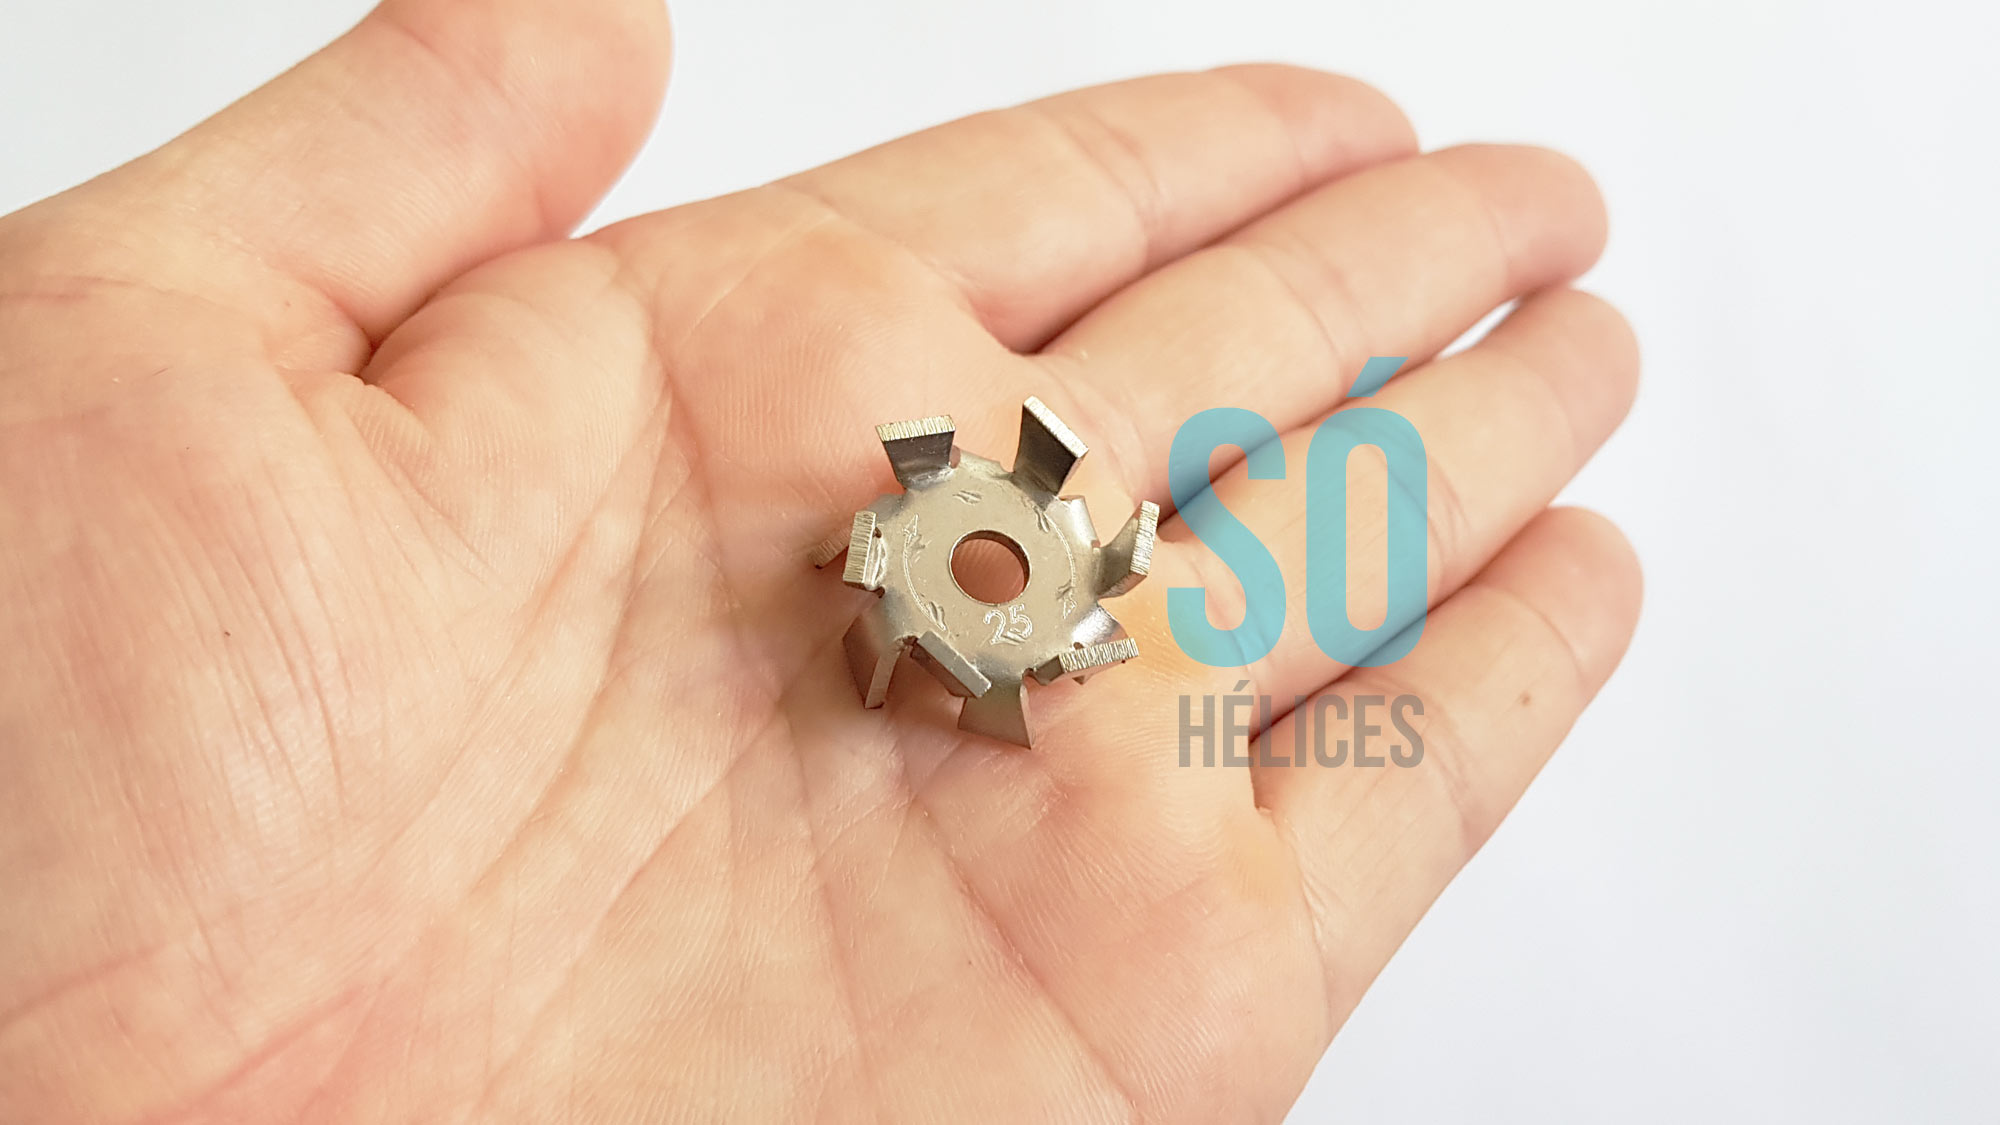 Misturador de laboratorio para pequenos lotes - 50ml